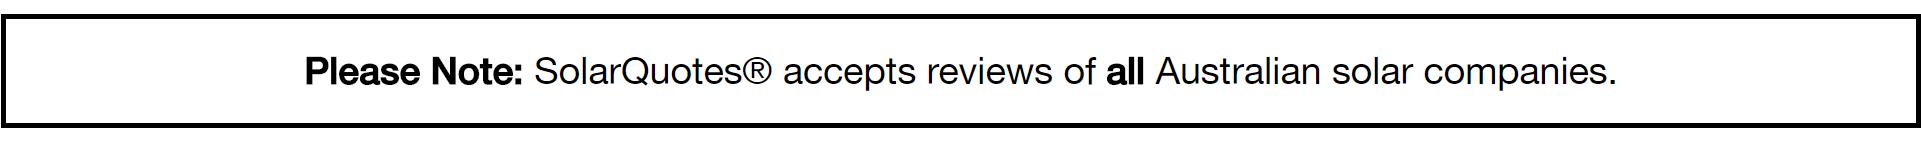 AGL Solar Reviews | 41,235 Solar Installer Reviews | SolarQuotes